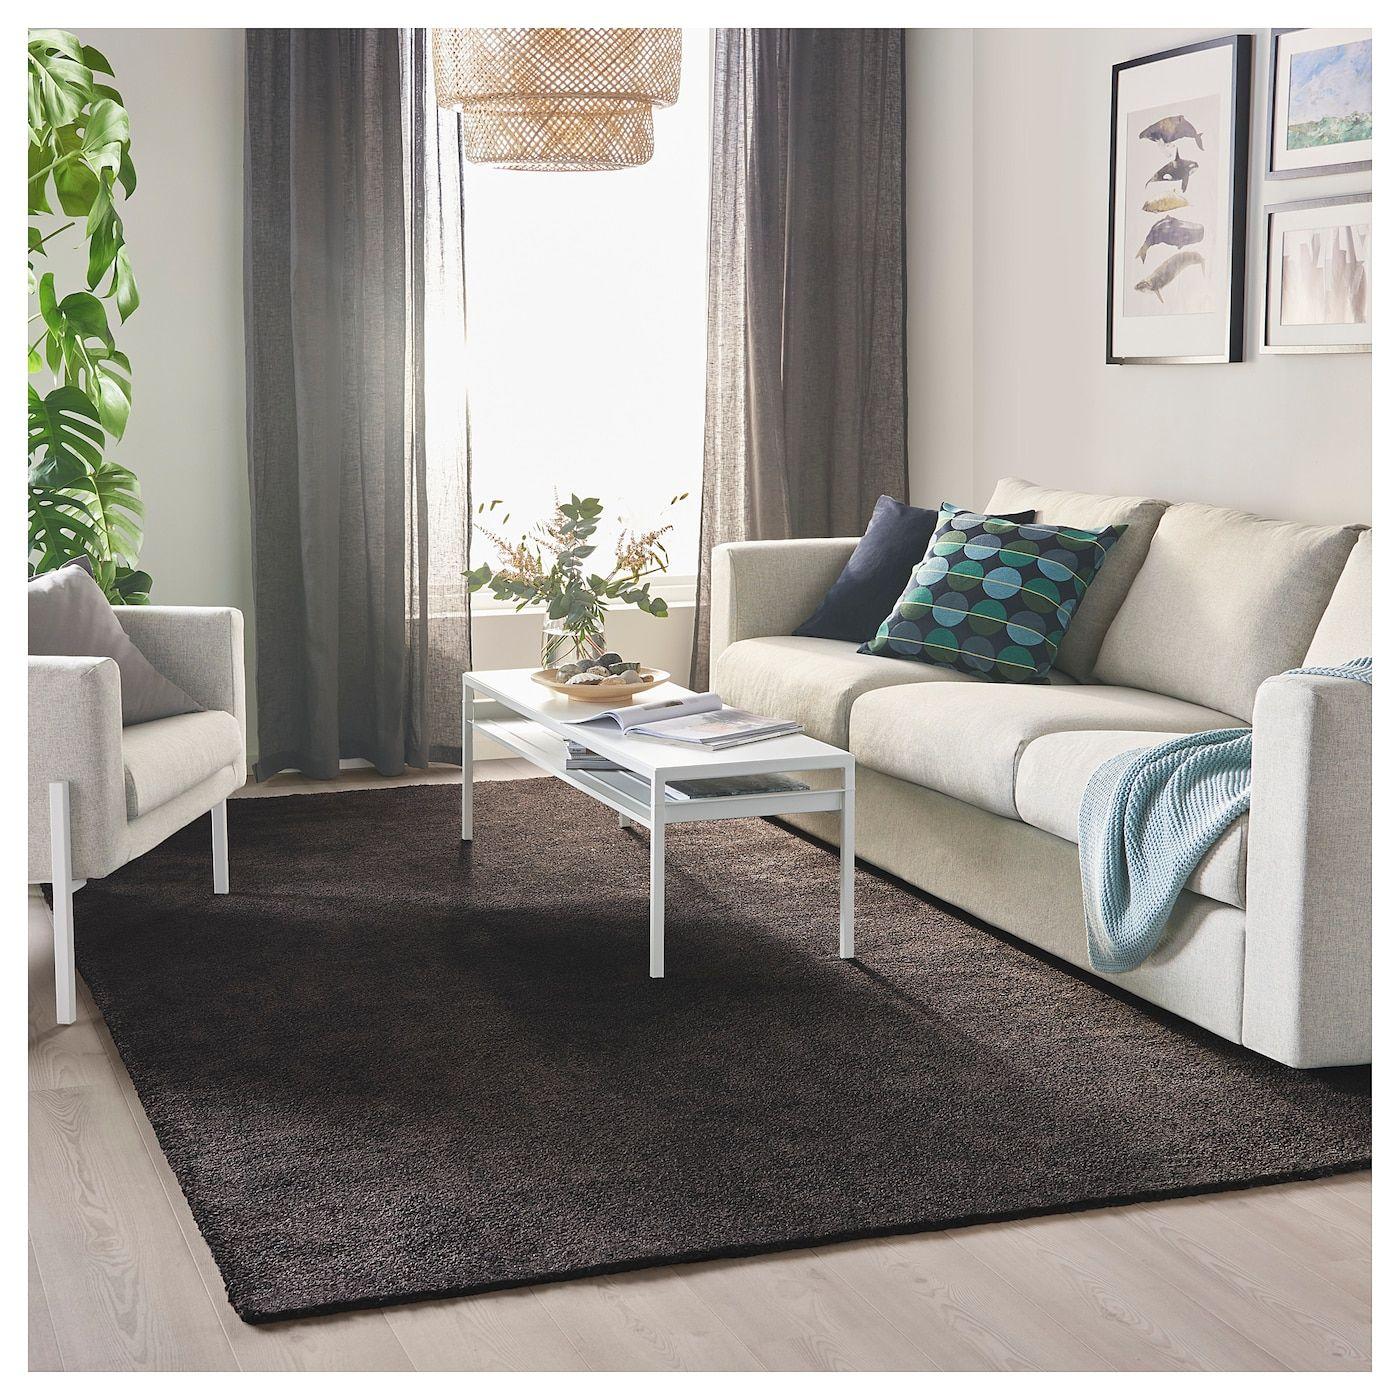 IKEA STOENSE Rug, low pile dark gray in 2019 Ikea rug